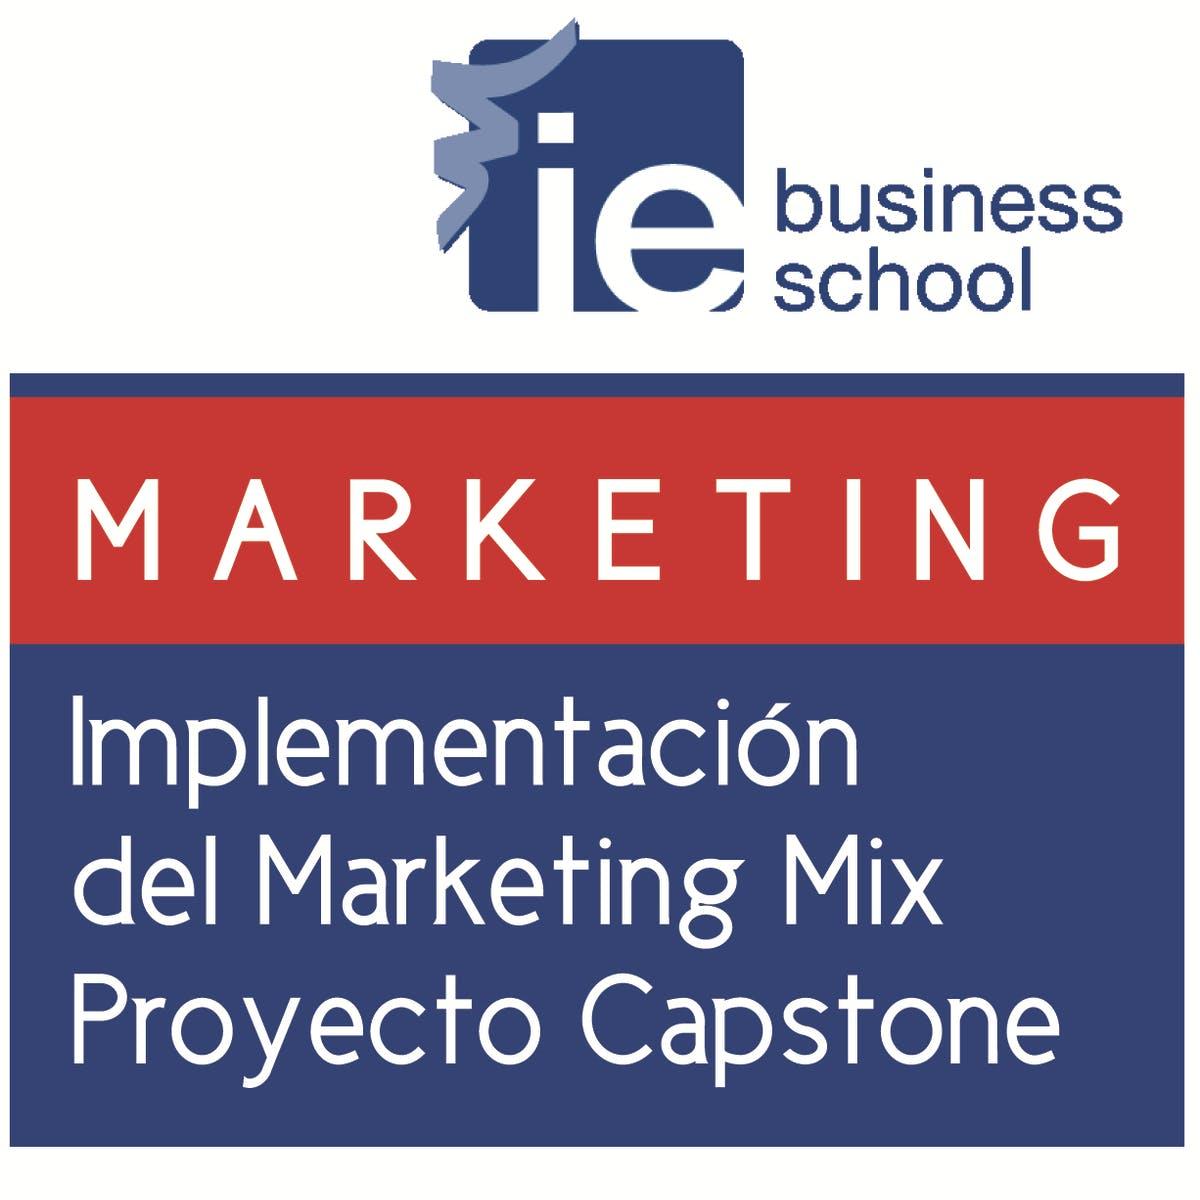 Implementación del Marketing Mix Proyecto Capstone